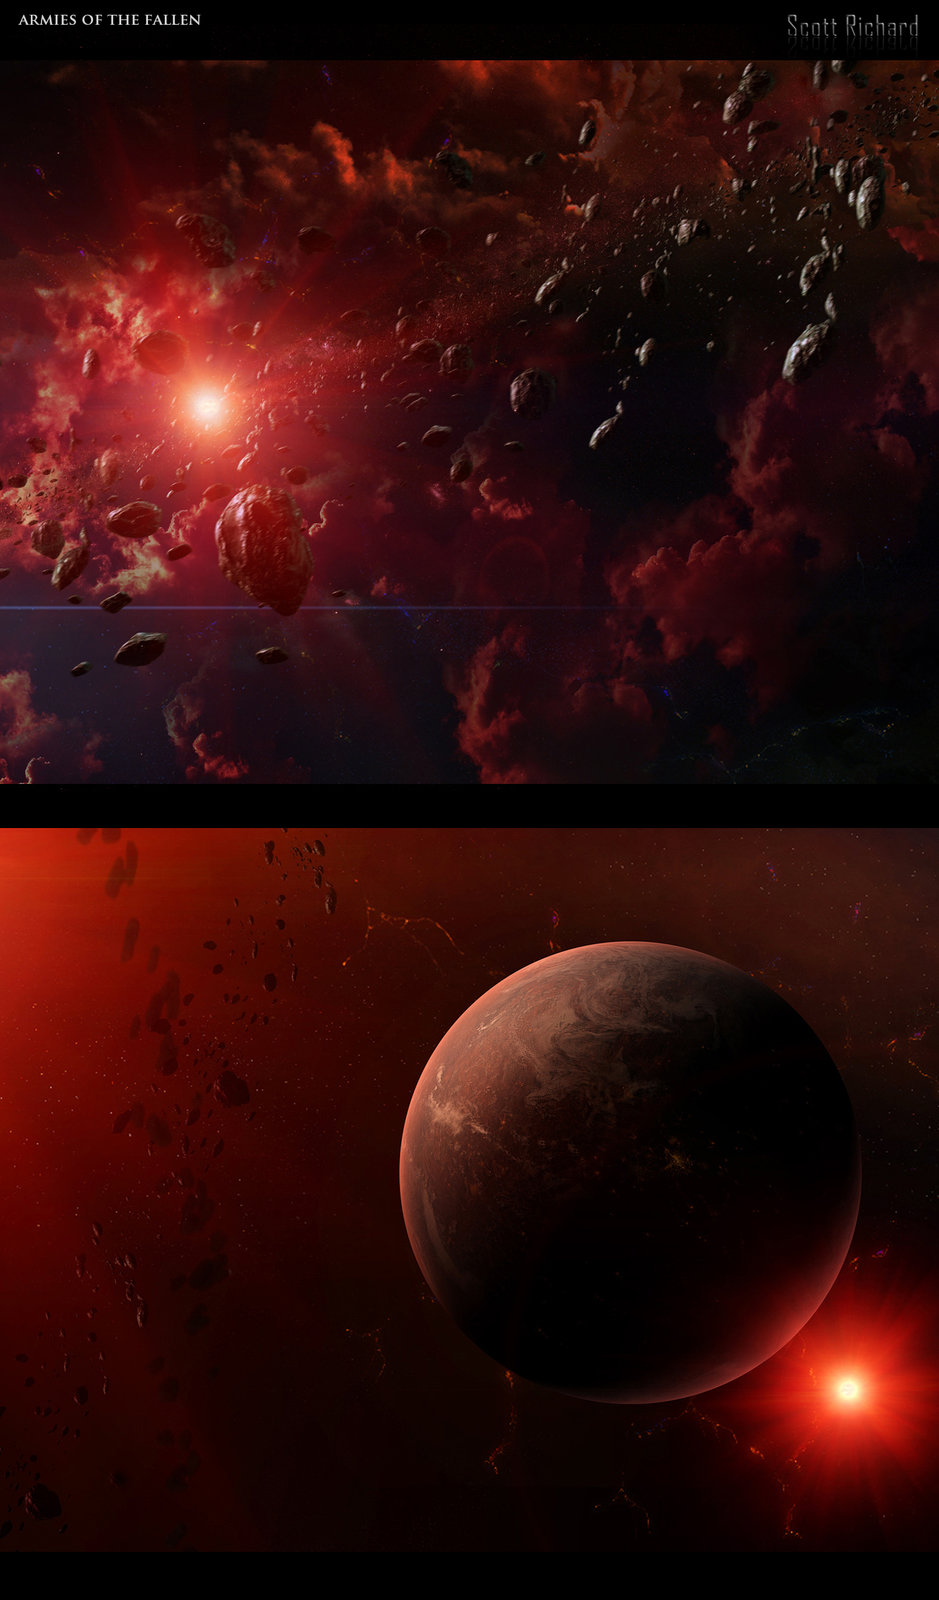 Star Wars Film concept